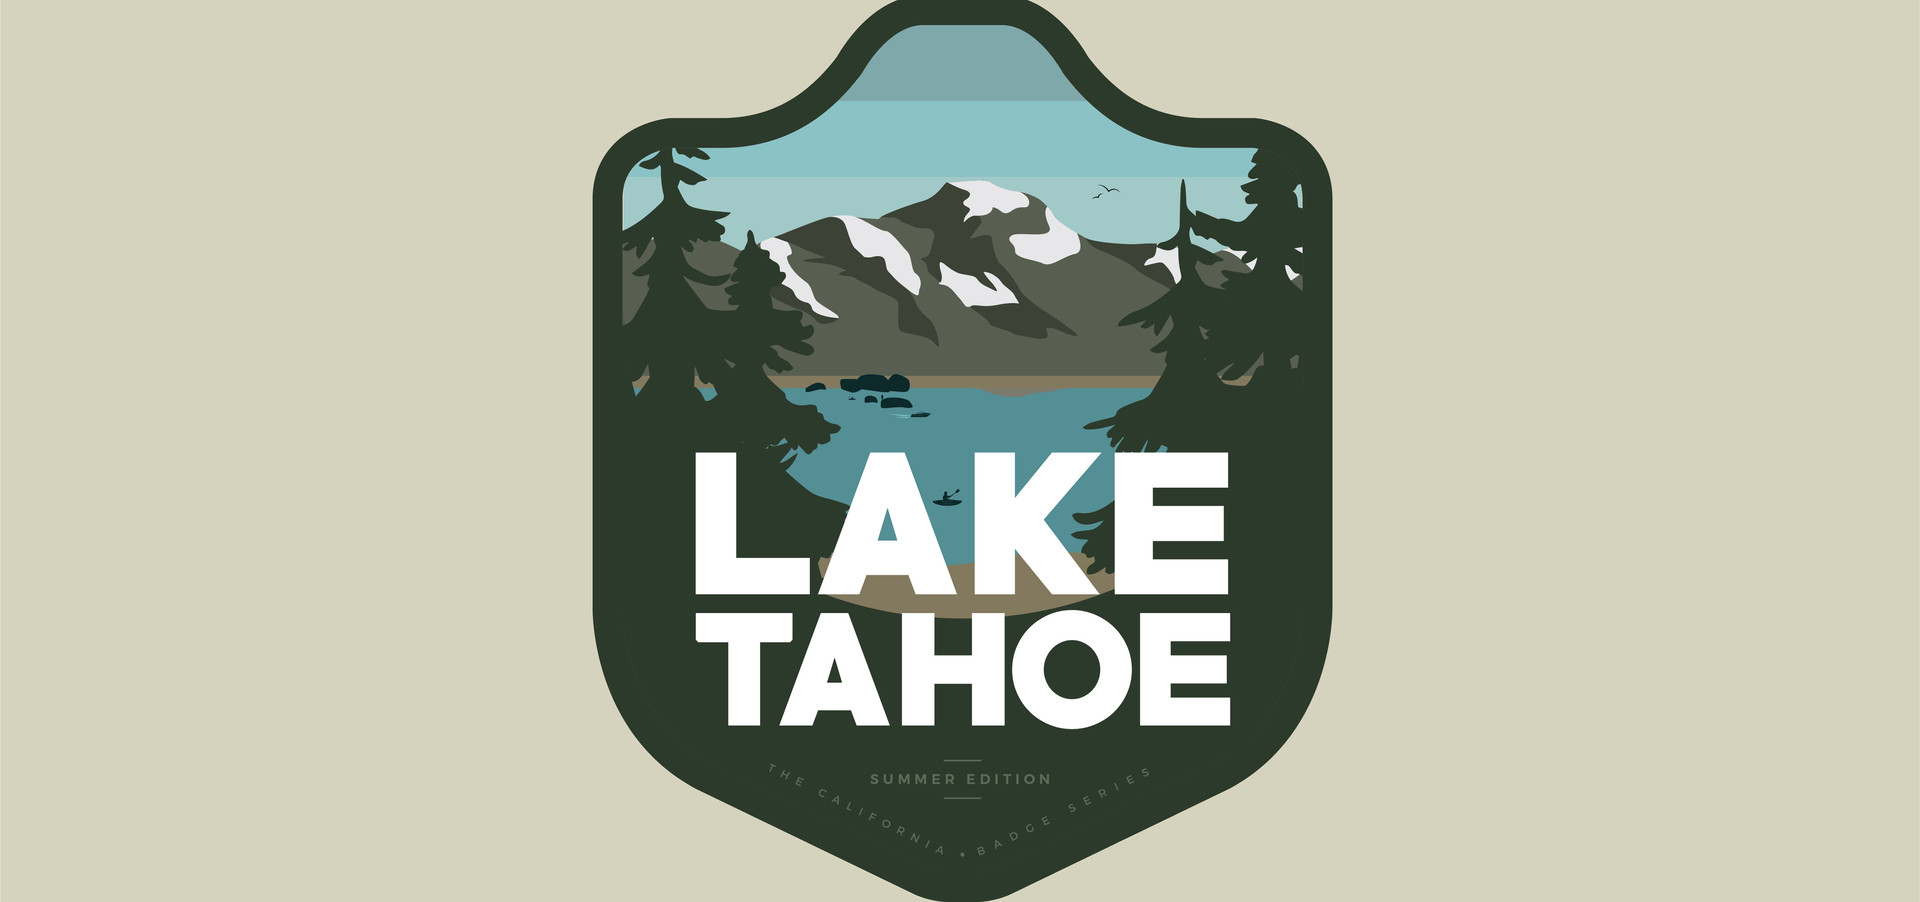 LakeTahoe-04.jpg